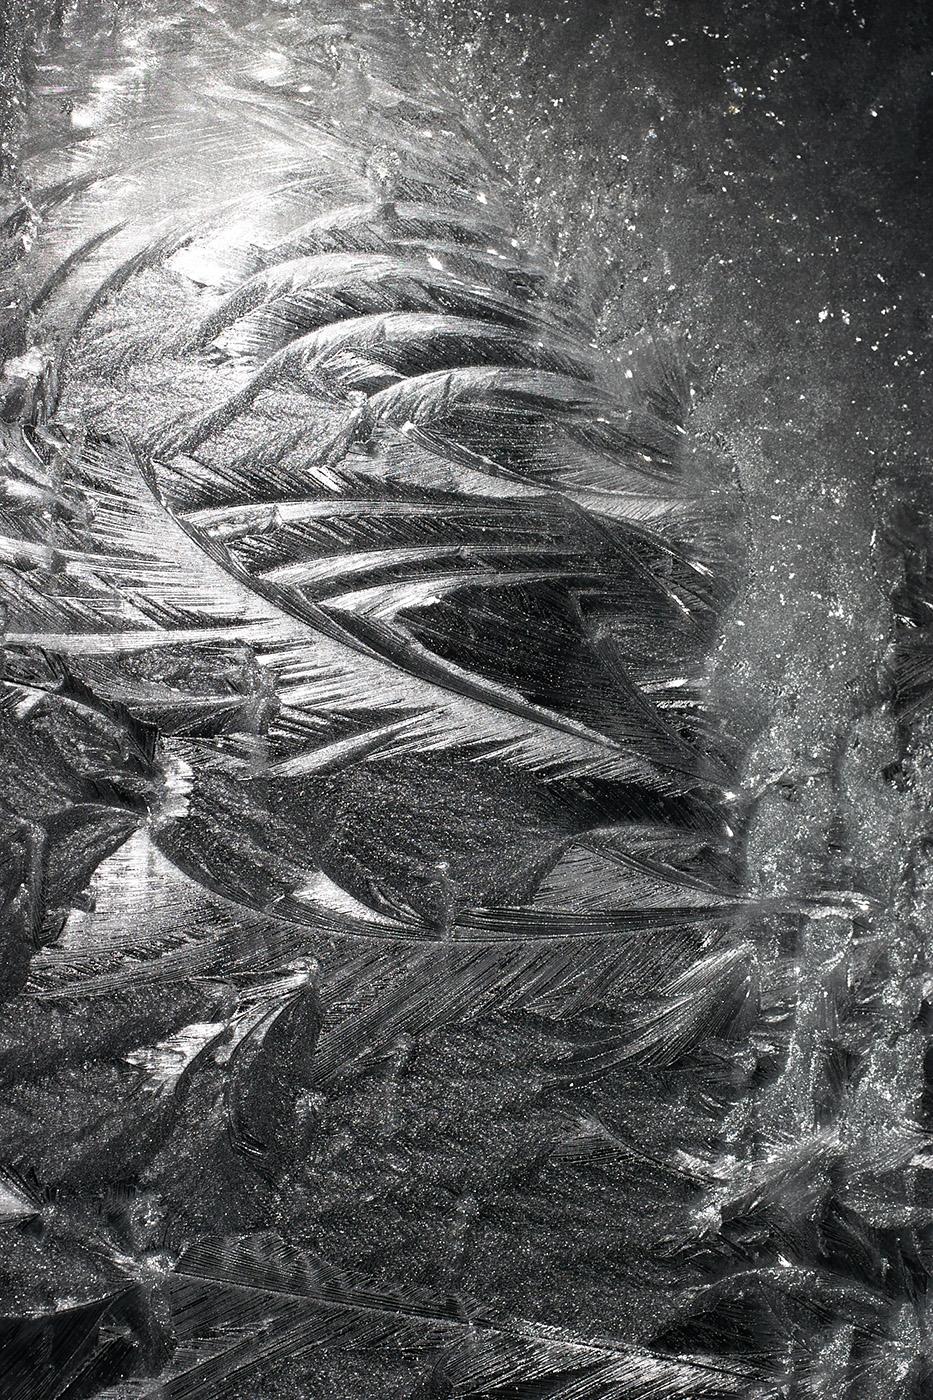 Ice Crystals on Window, Hamilton, New York